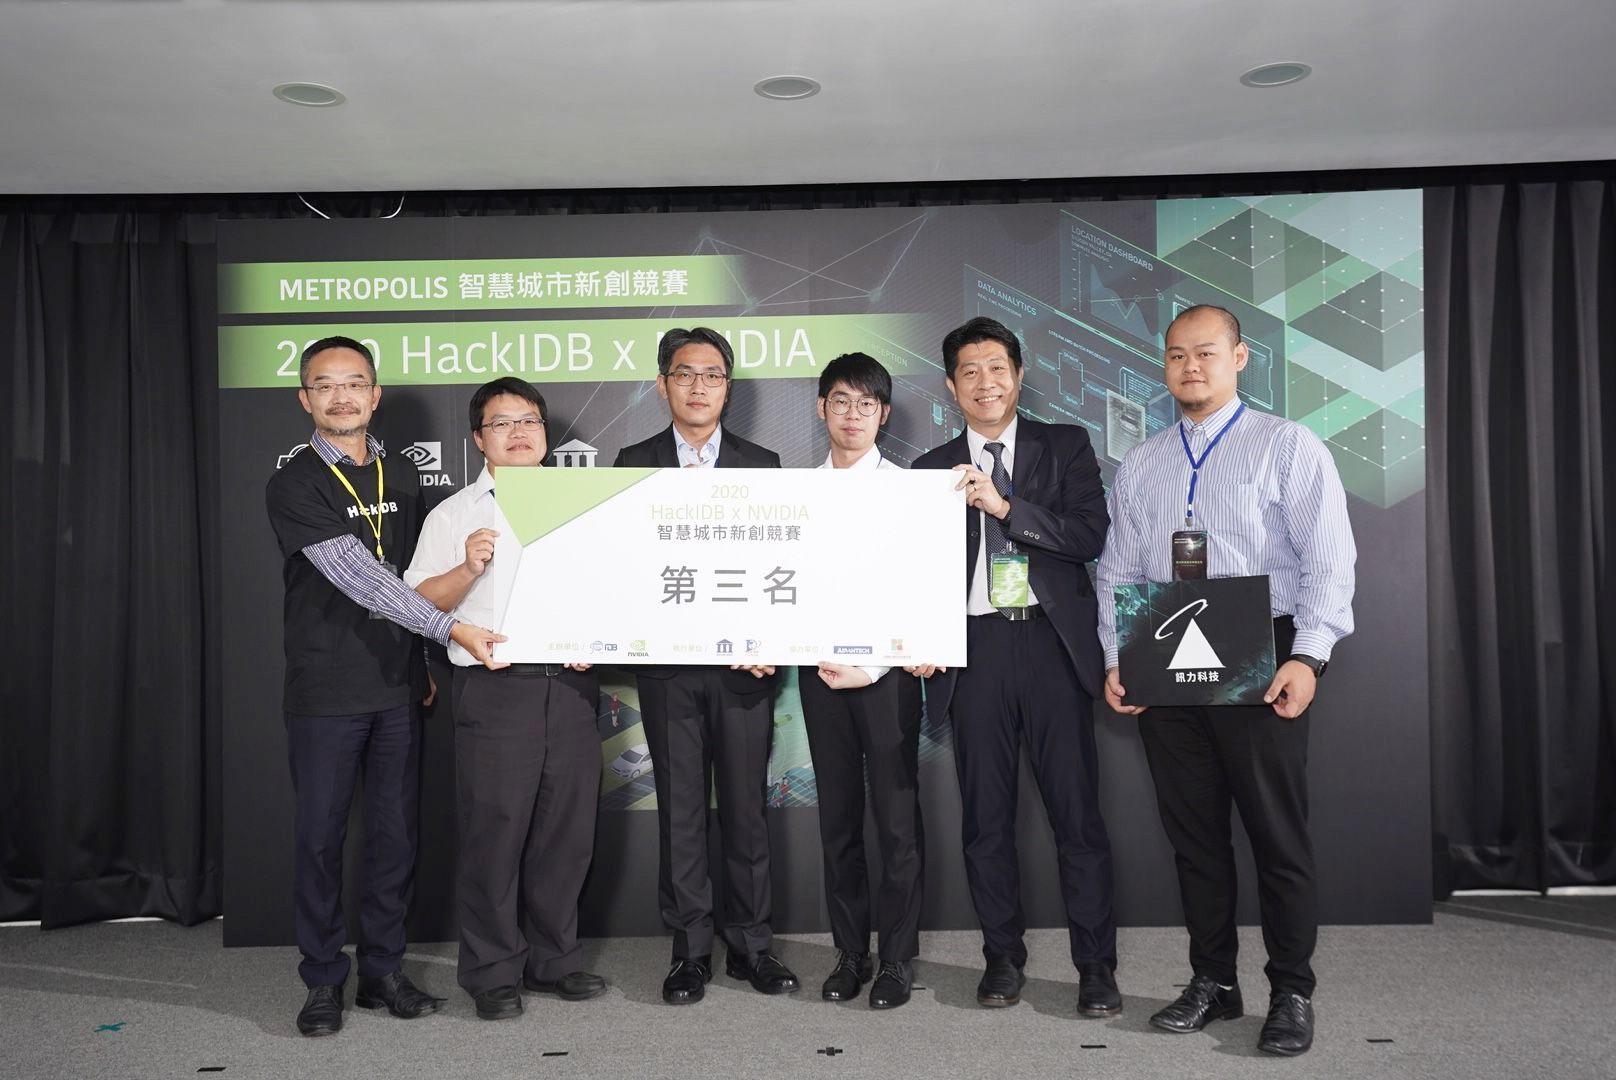 2020 HackIDB x NVIDIA (Smart City Startup Competition)